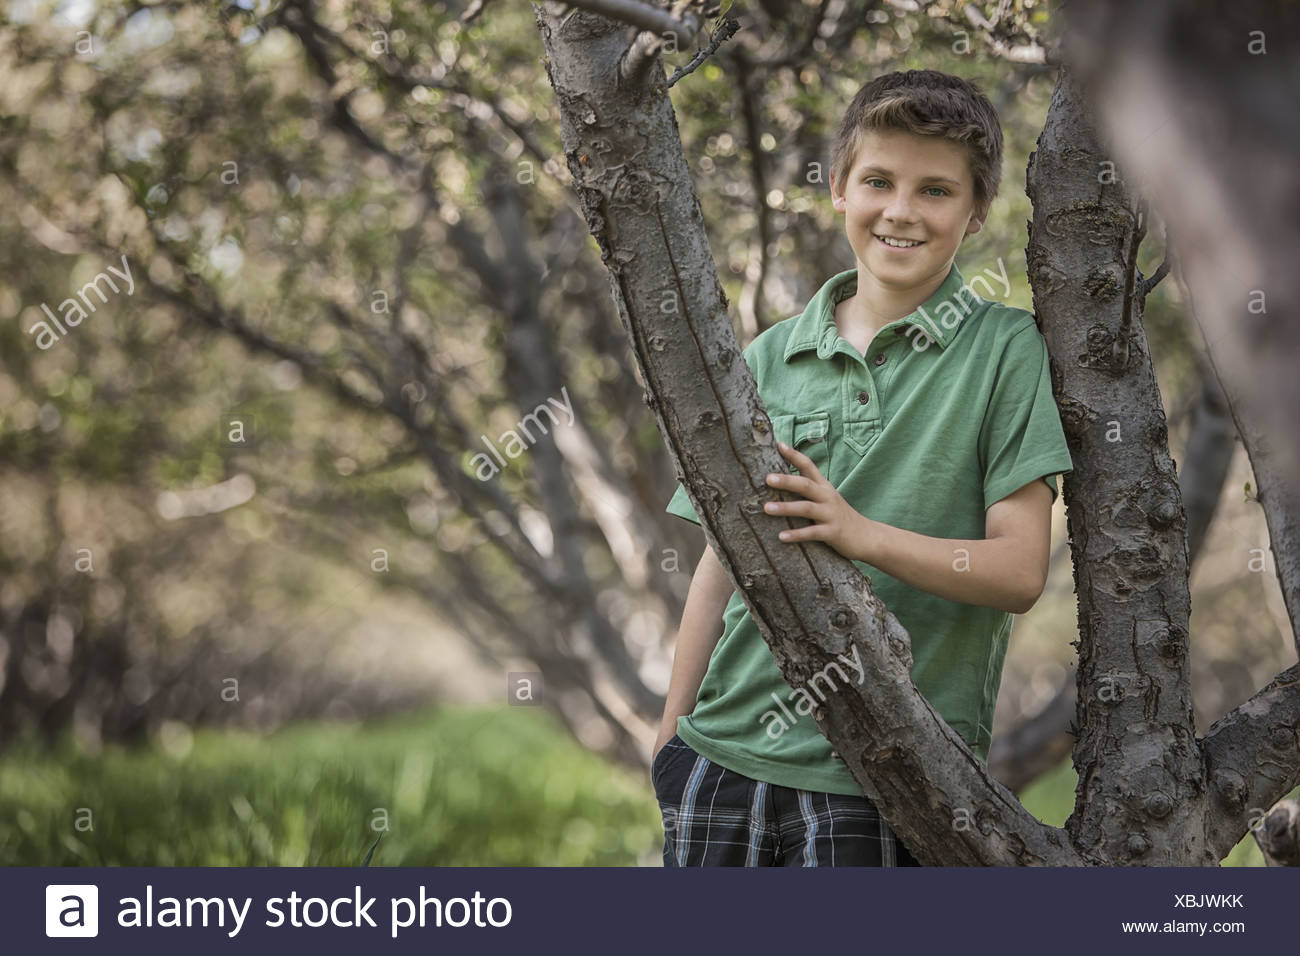 Utah USA boy woodland tunnel tree branches meeting overhead - Stock Image